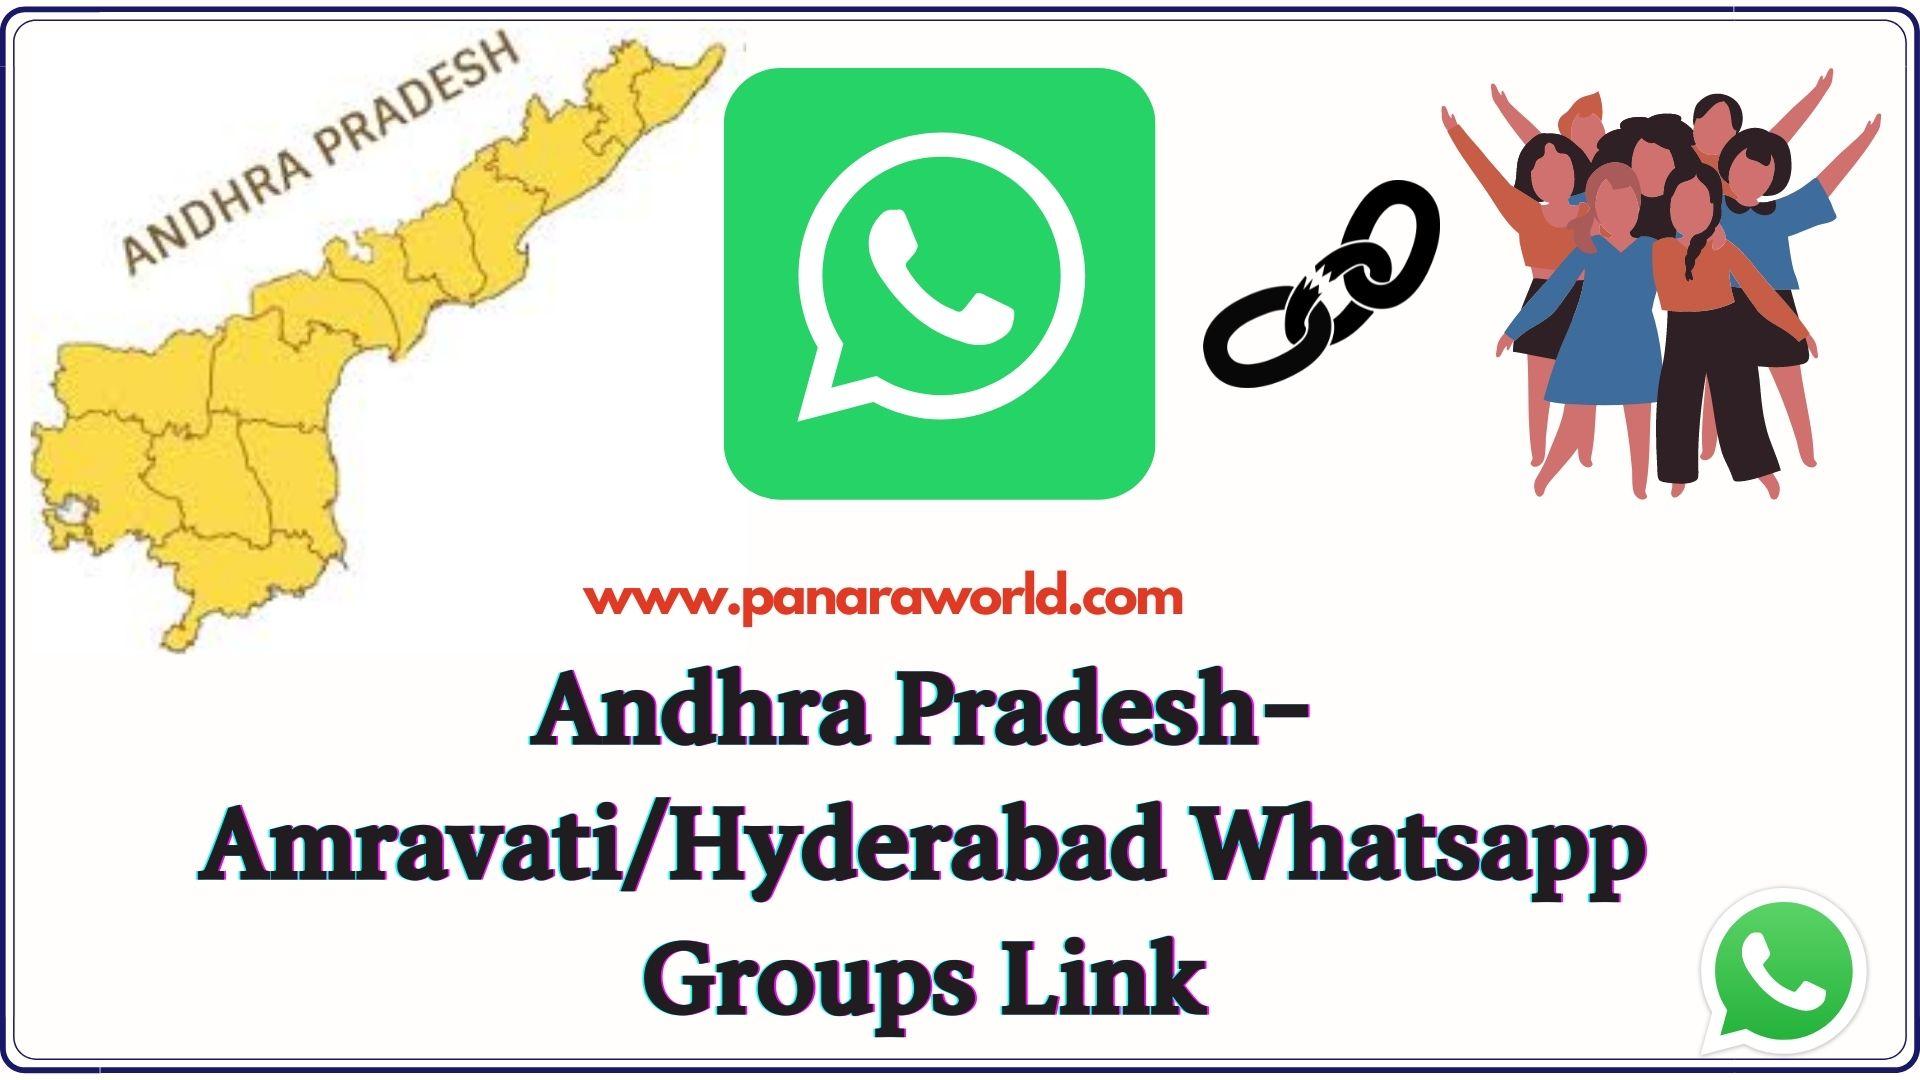 Andhra Pradesh- Amravati/Hyderabad Whatsapp Groups Link